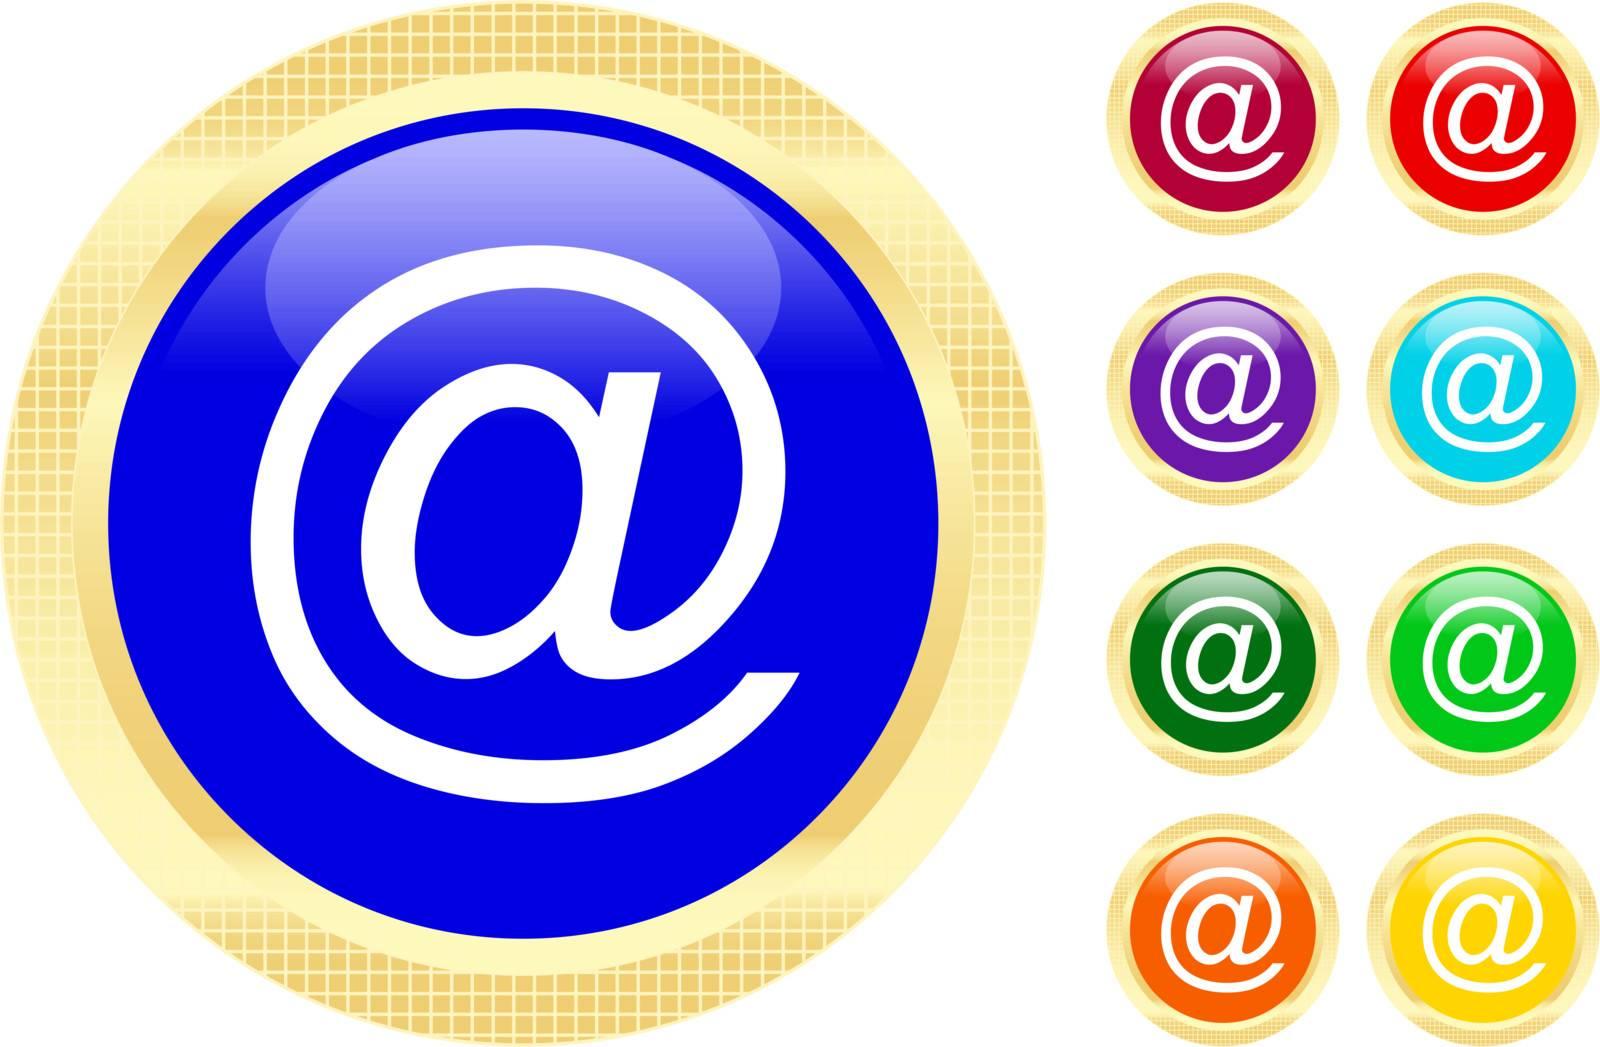 E-mail symbol on shiny buttons